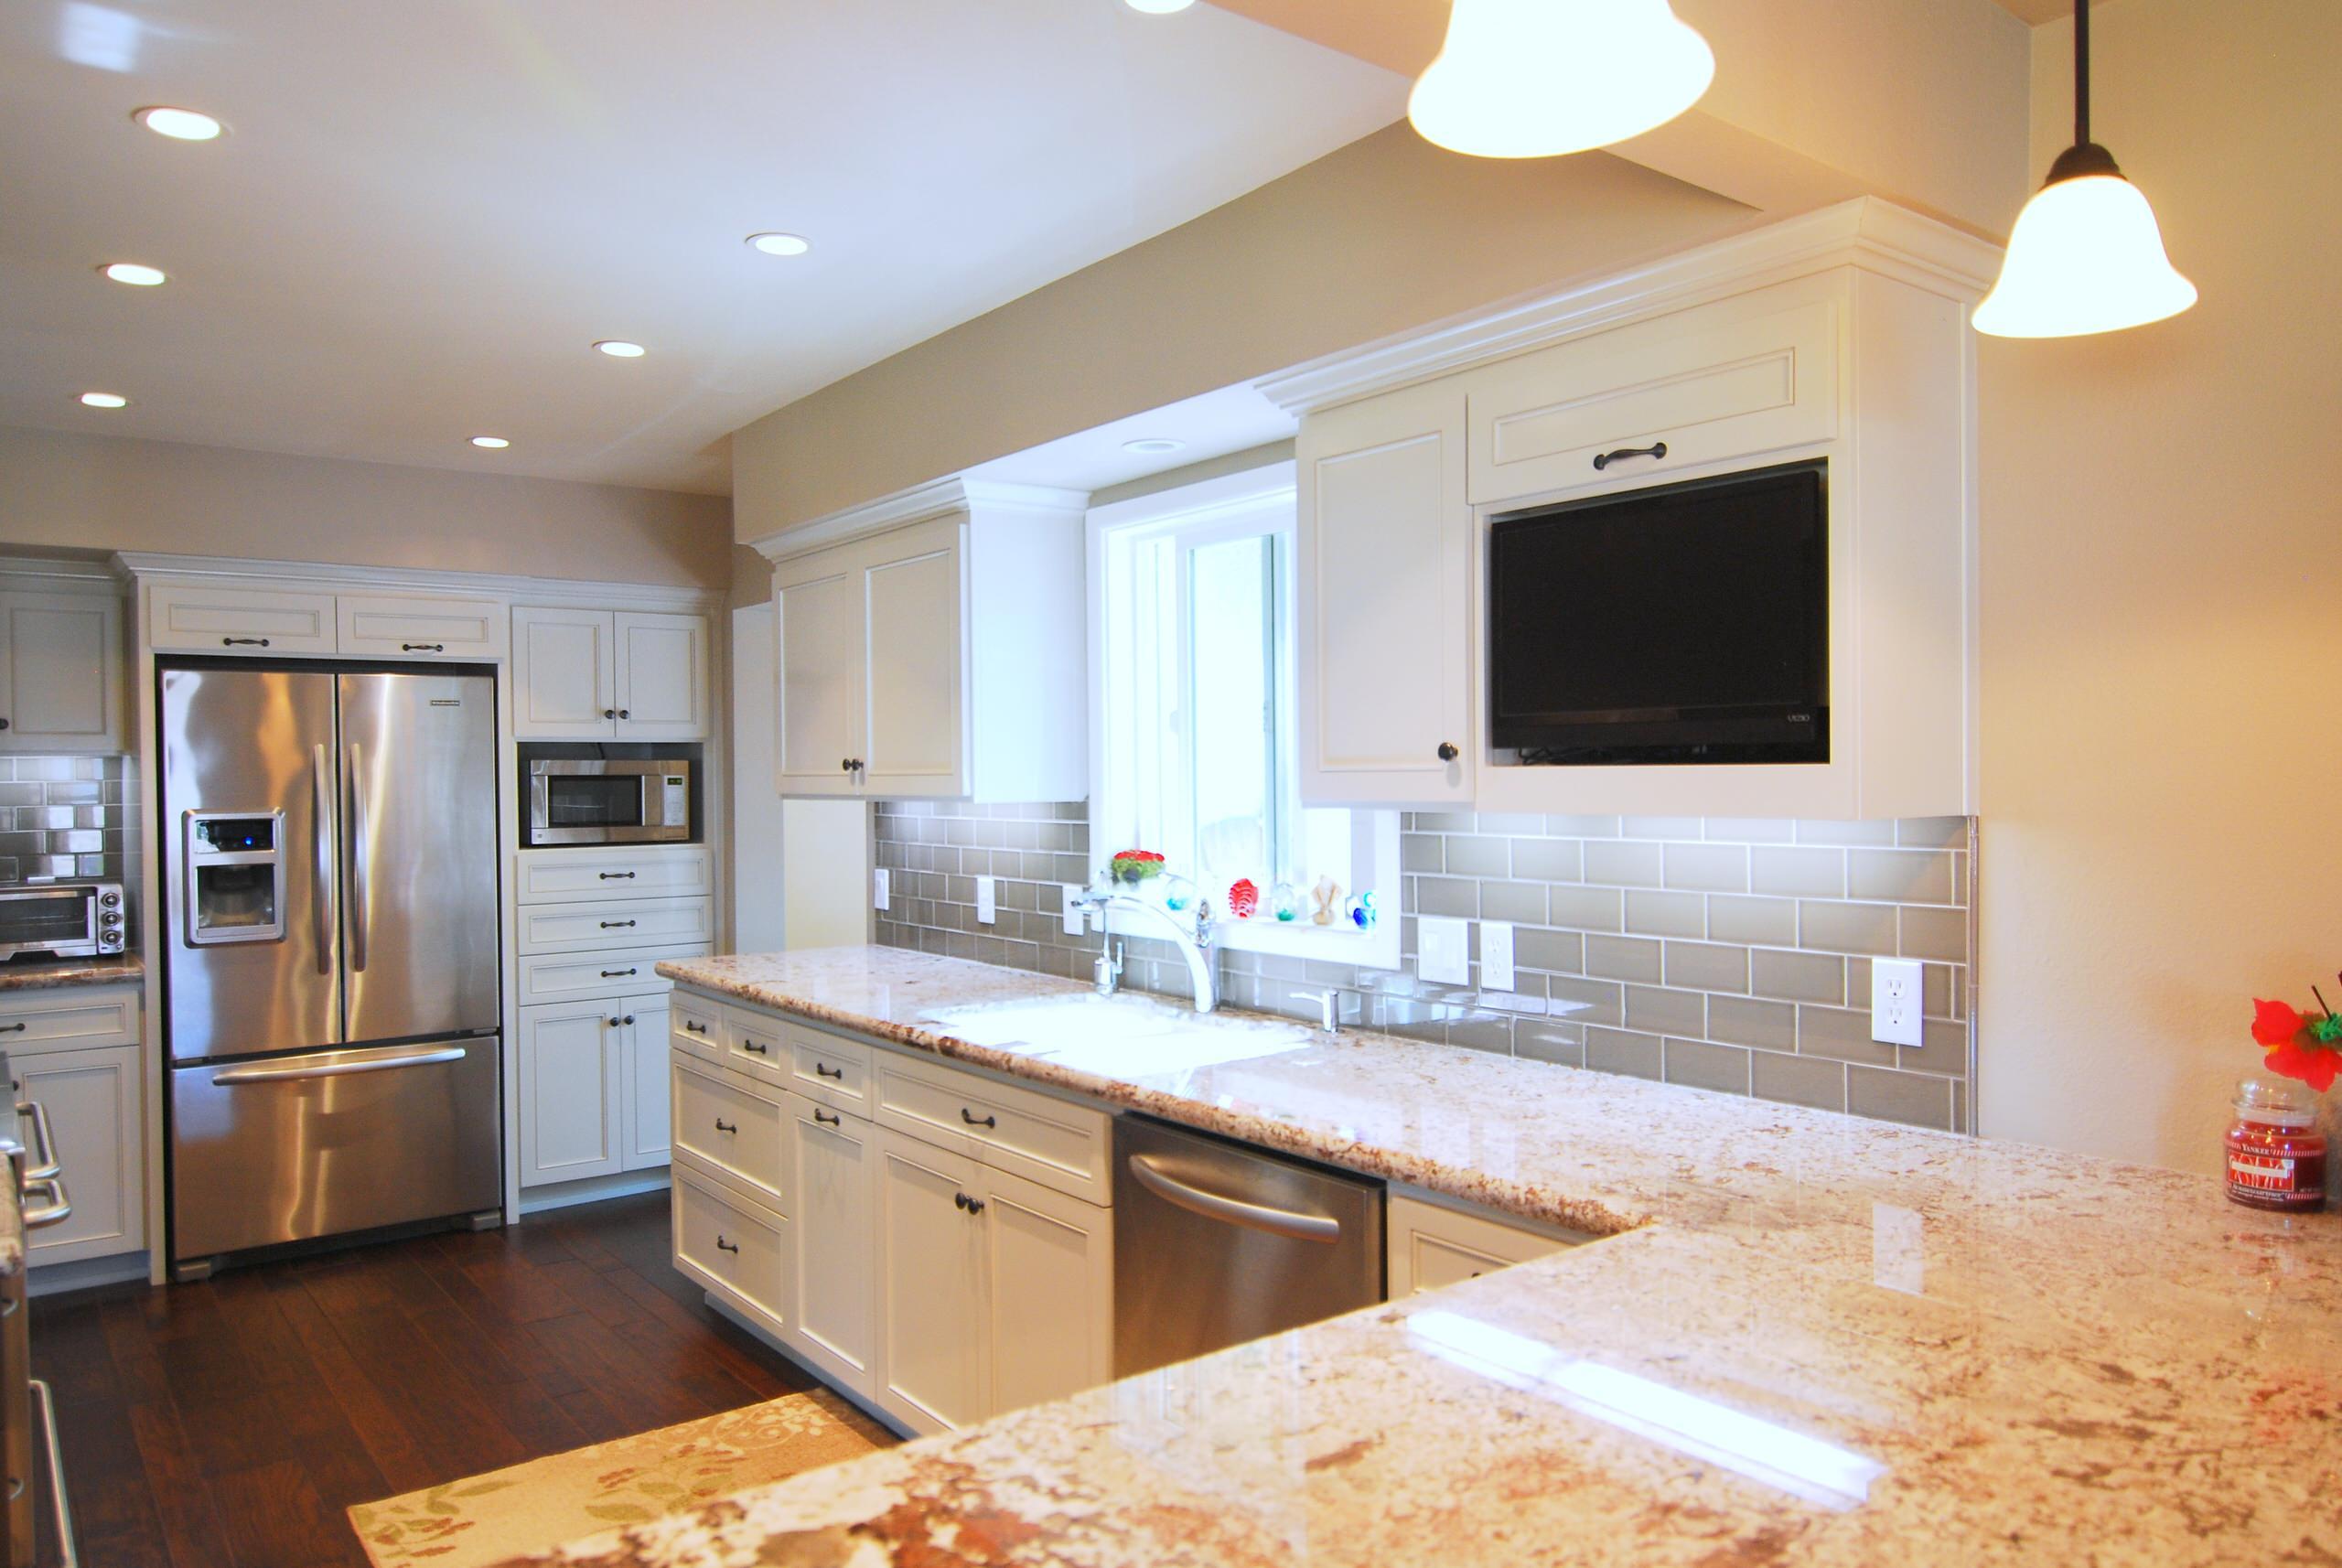 Galley Kitchen Rennovation